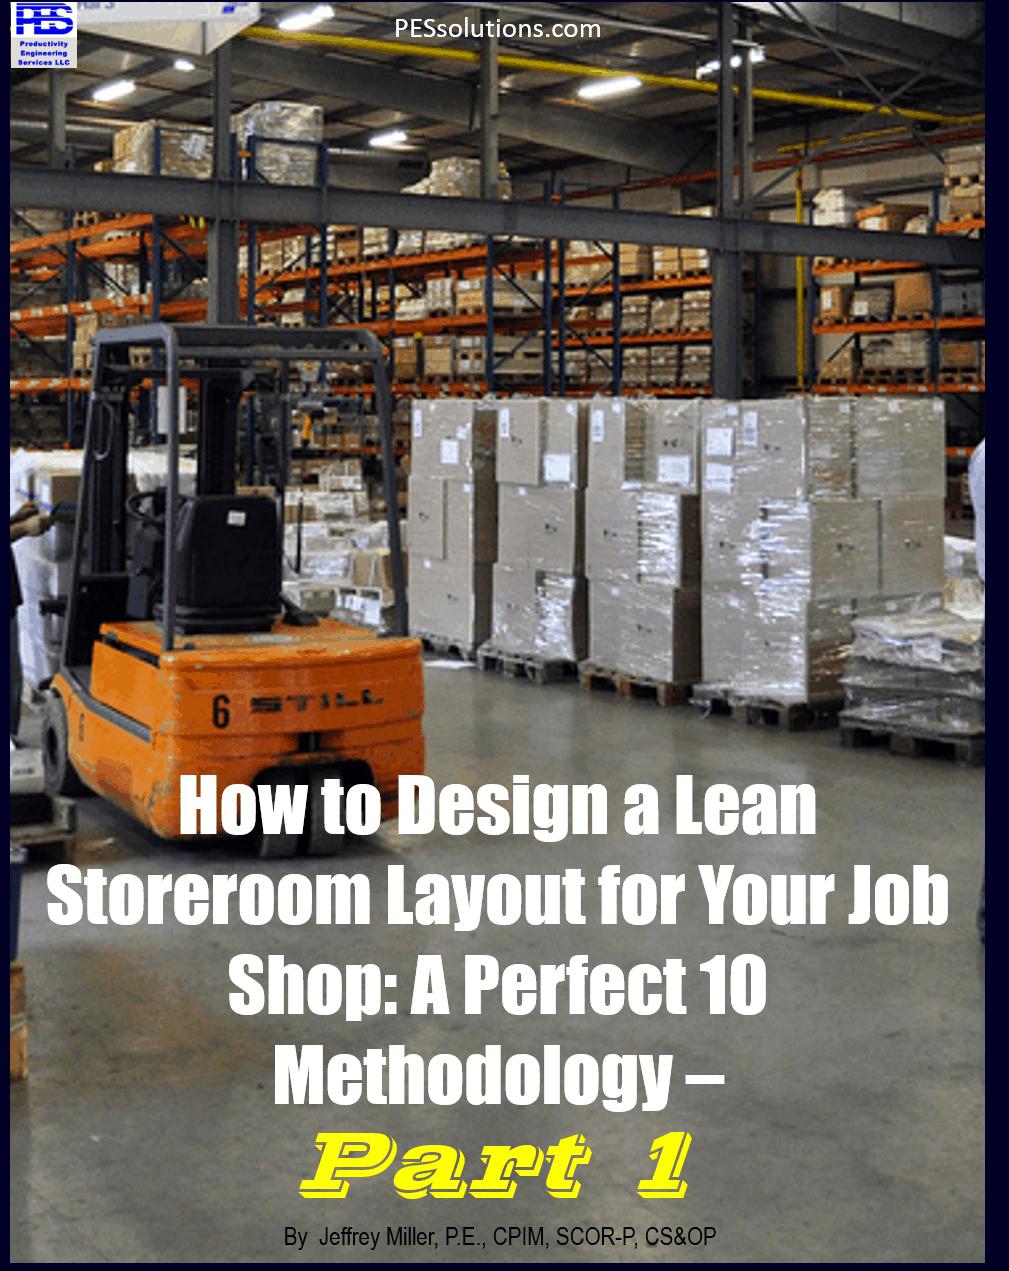 Job Shop Storeroom Image